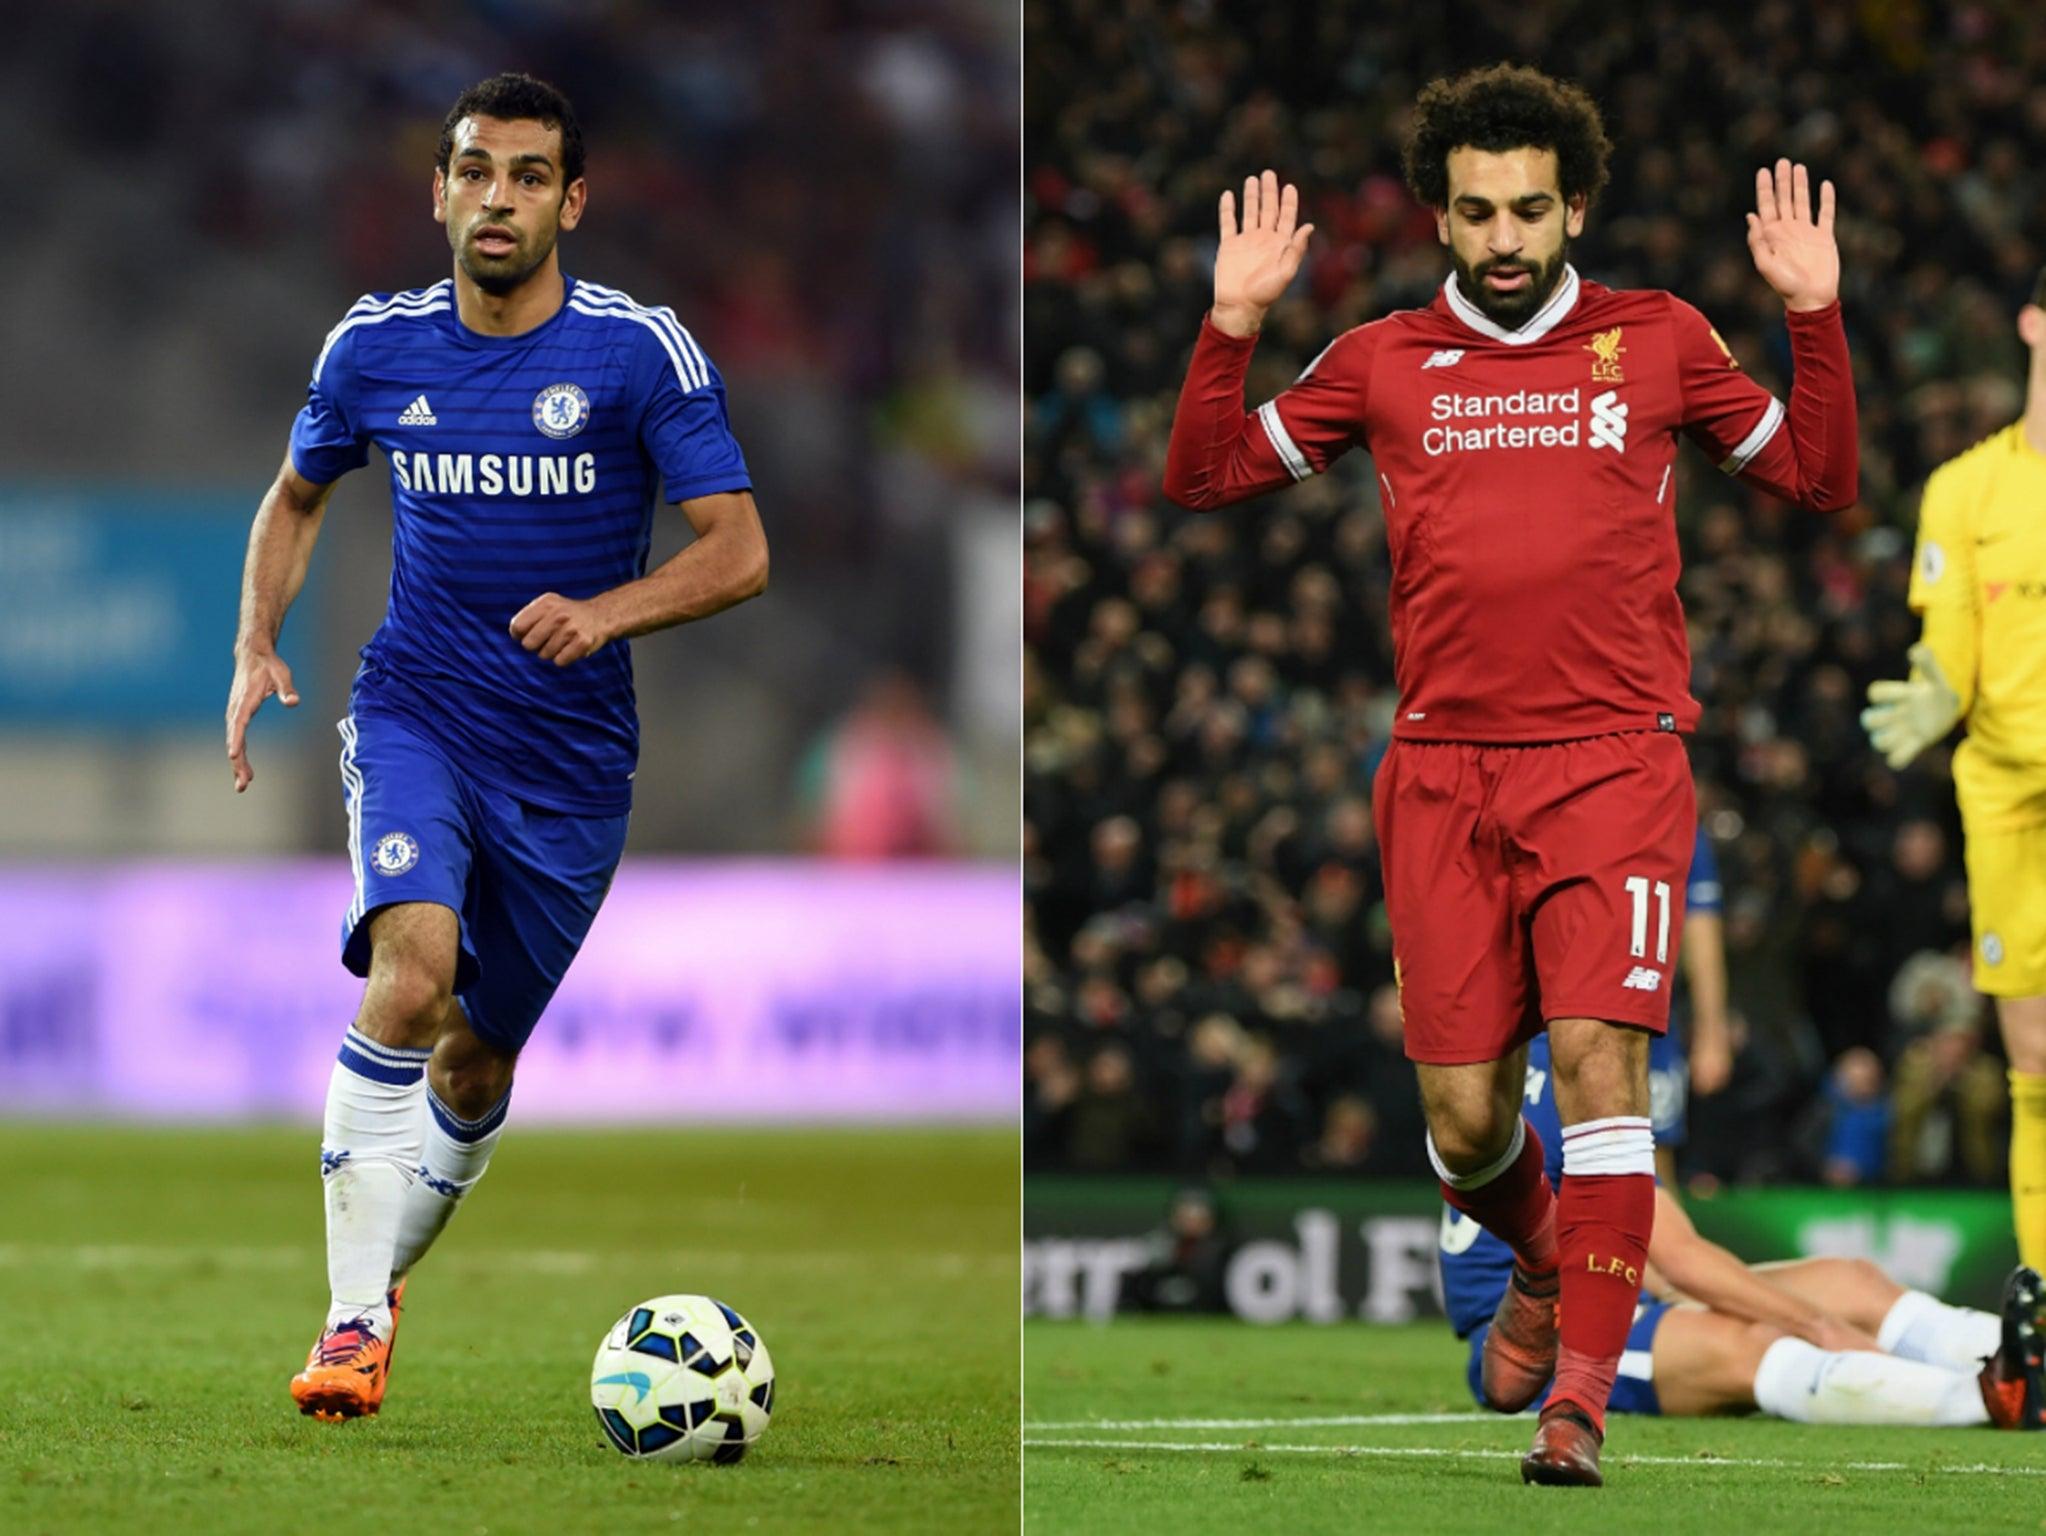 Samsclub Credit Login >> Liverpool's Mohamed Salah deserves credit for having the ...